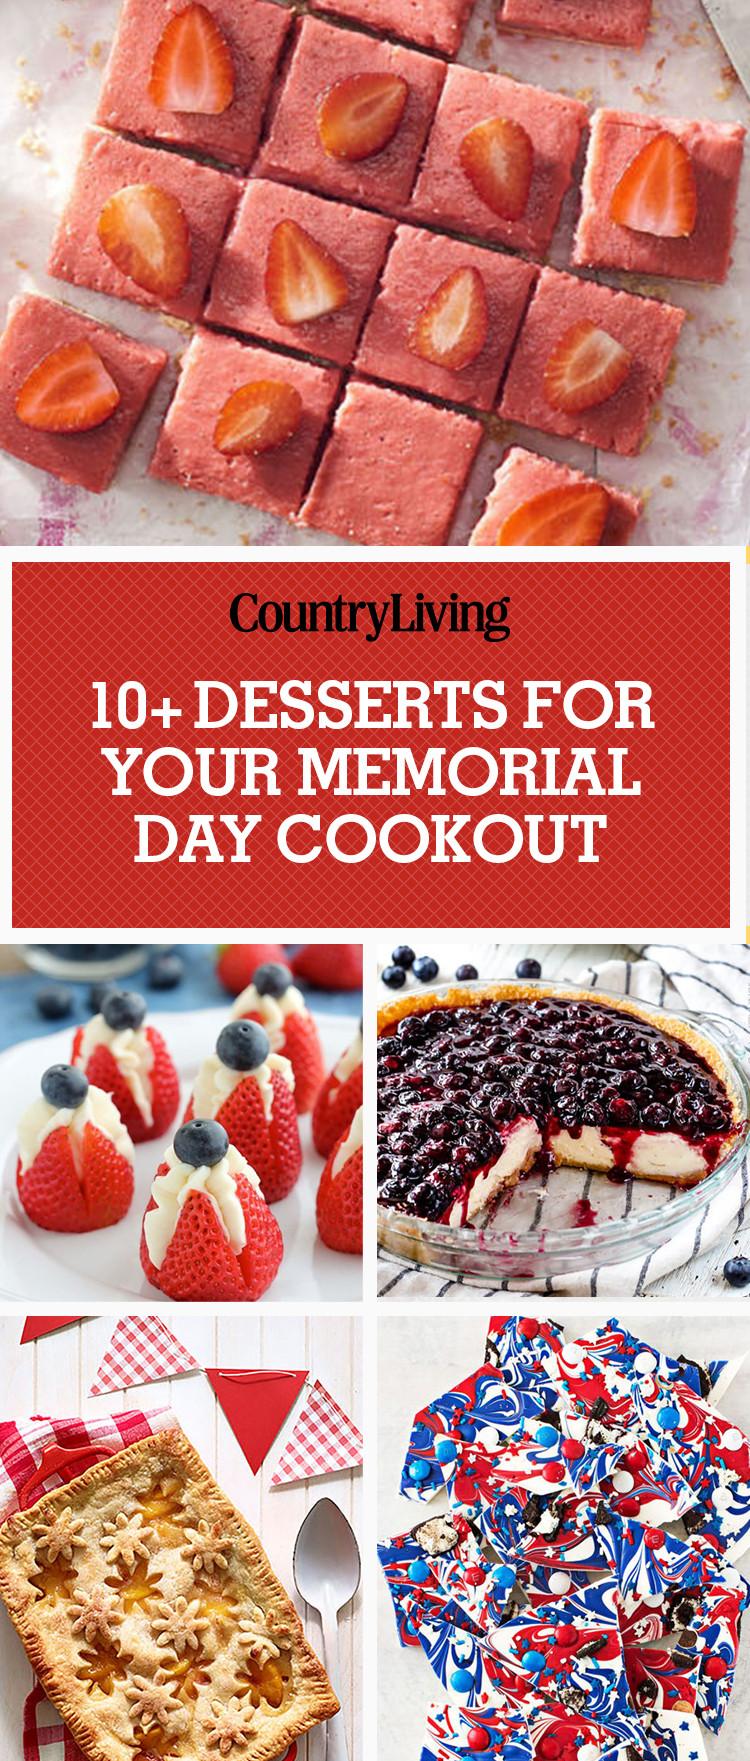 Memorial Day Desserts Ideas  13 Easy Memorial Day Desserts Best Recipes for Memorial